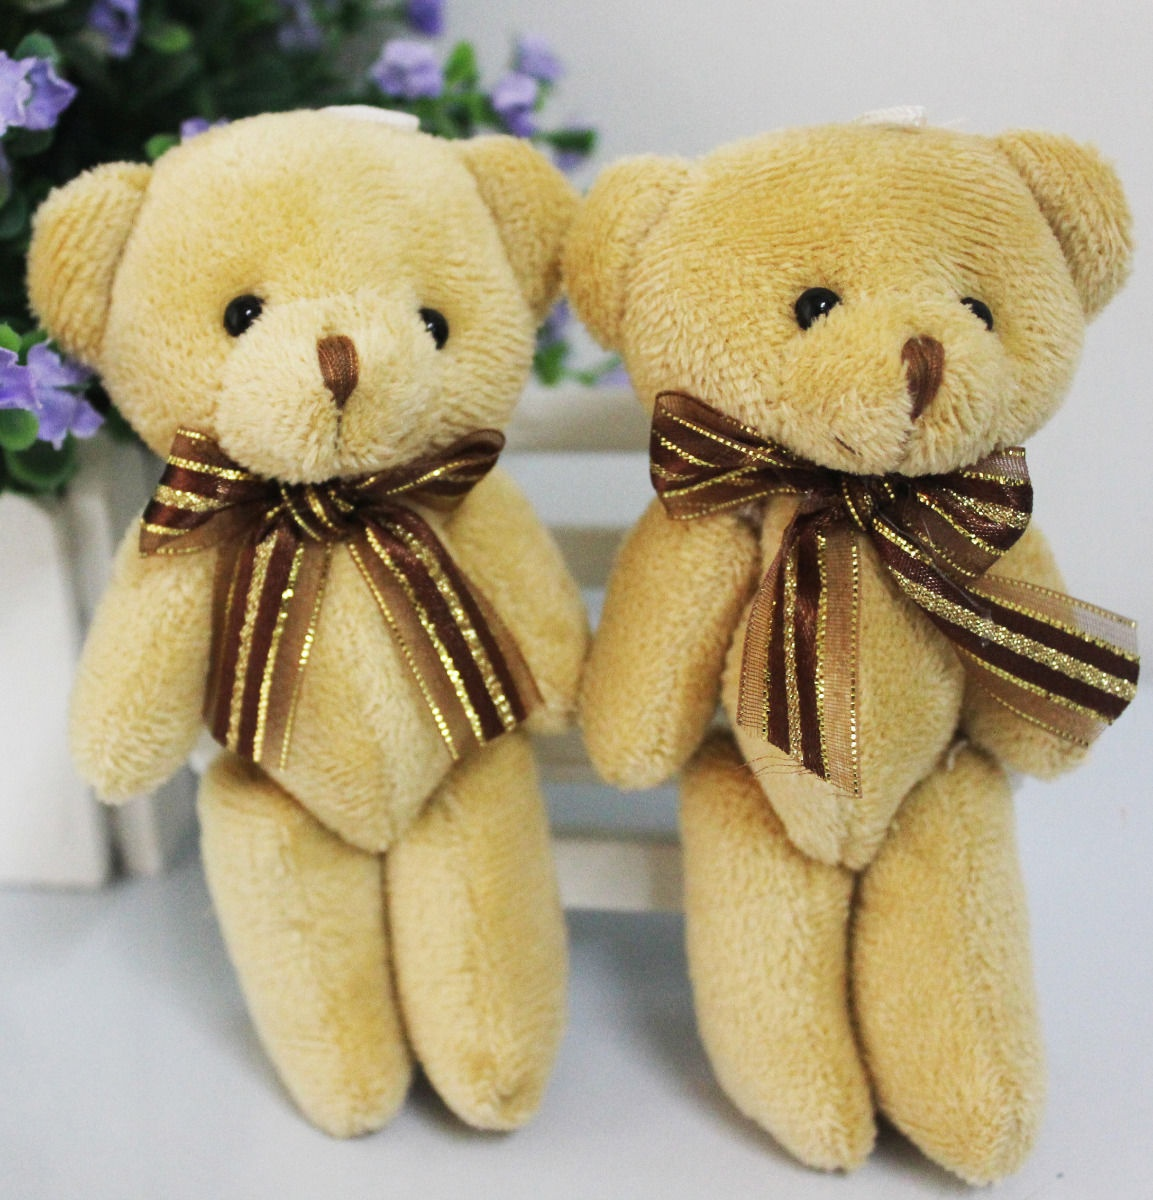 TEUS 5Pcs Kawaii Mini Jointed Stuffed Bear Plush Pendant Bouquet Dolls KidsS